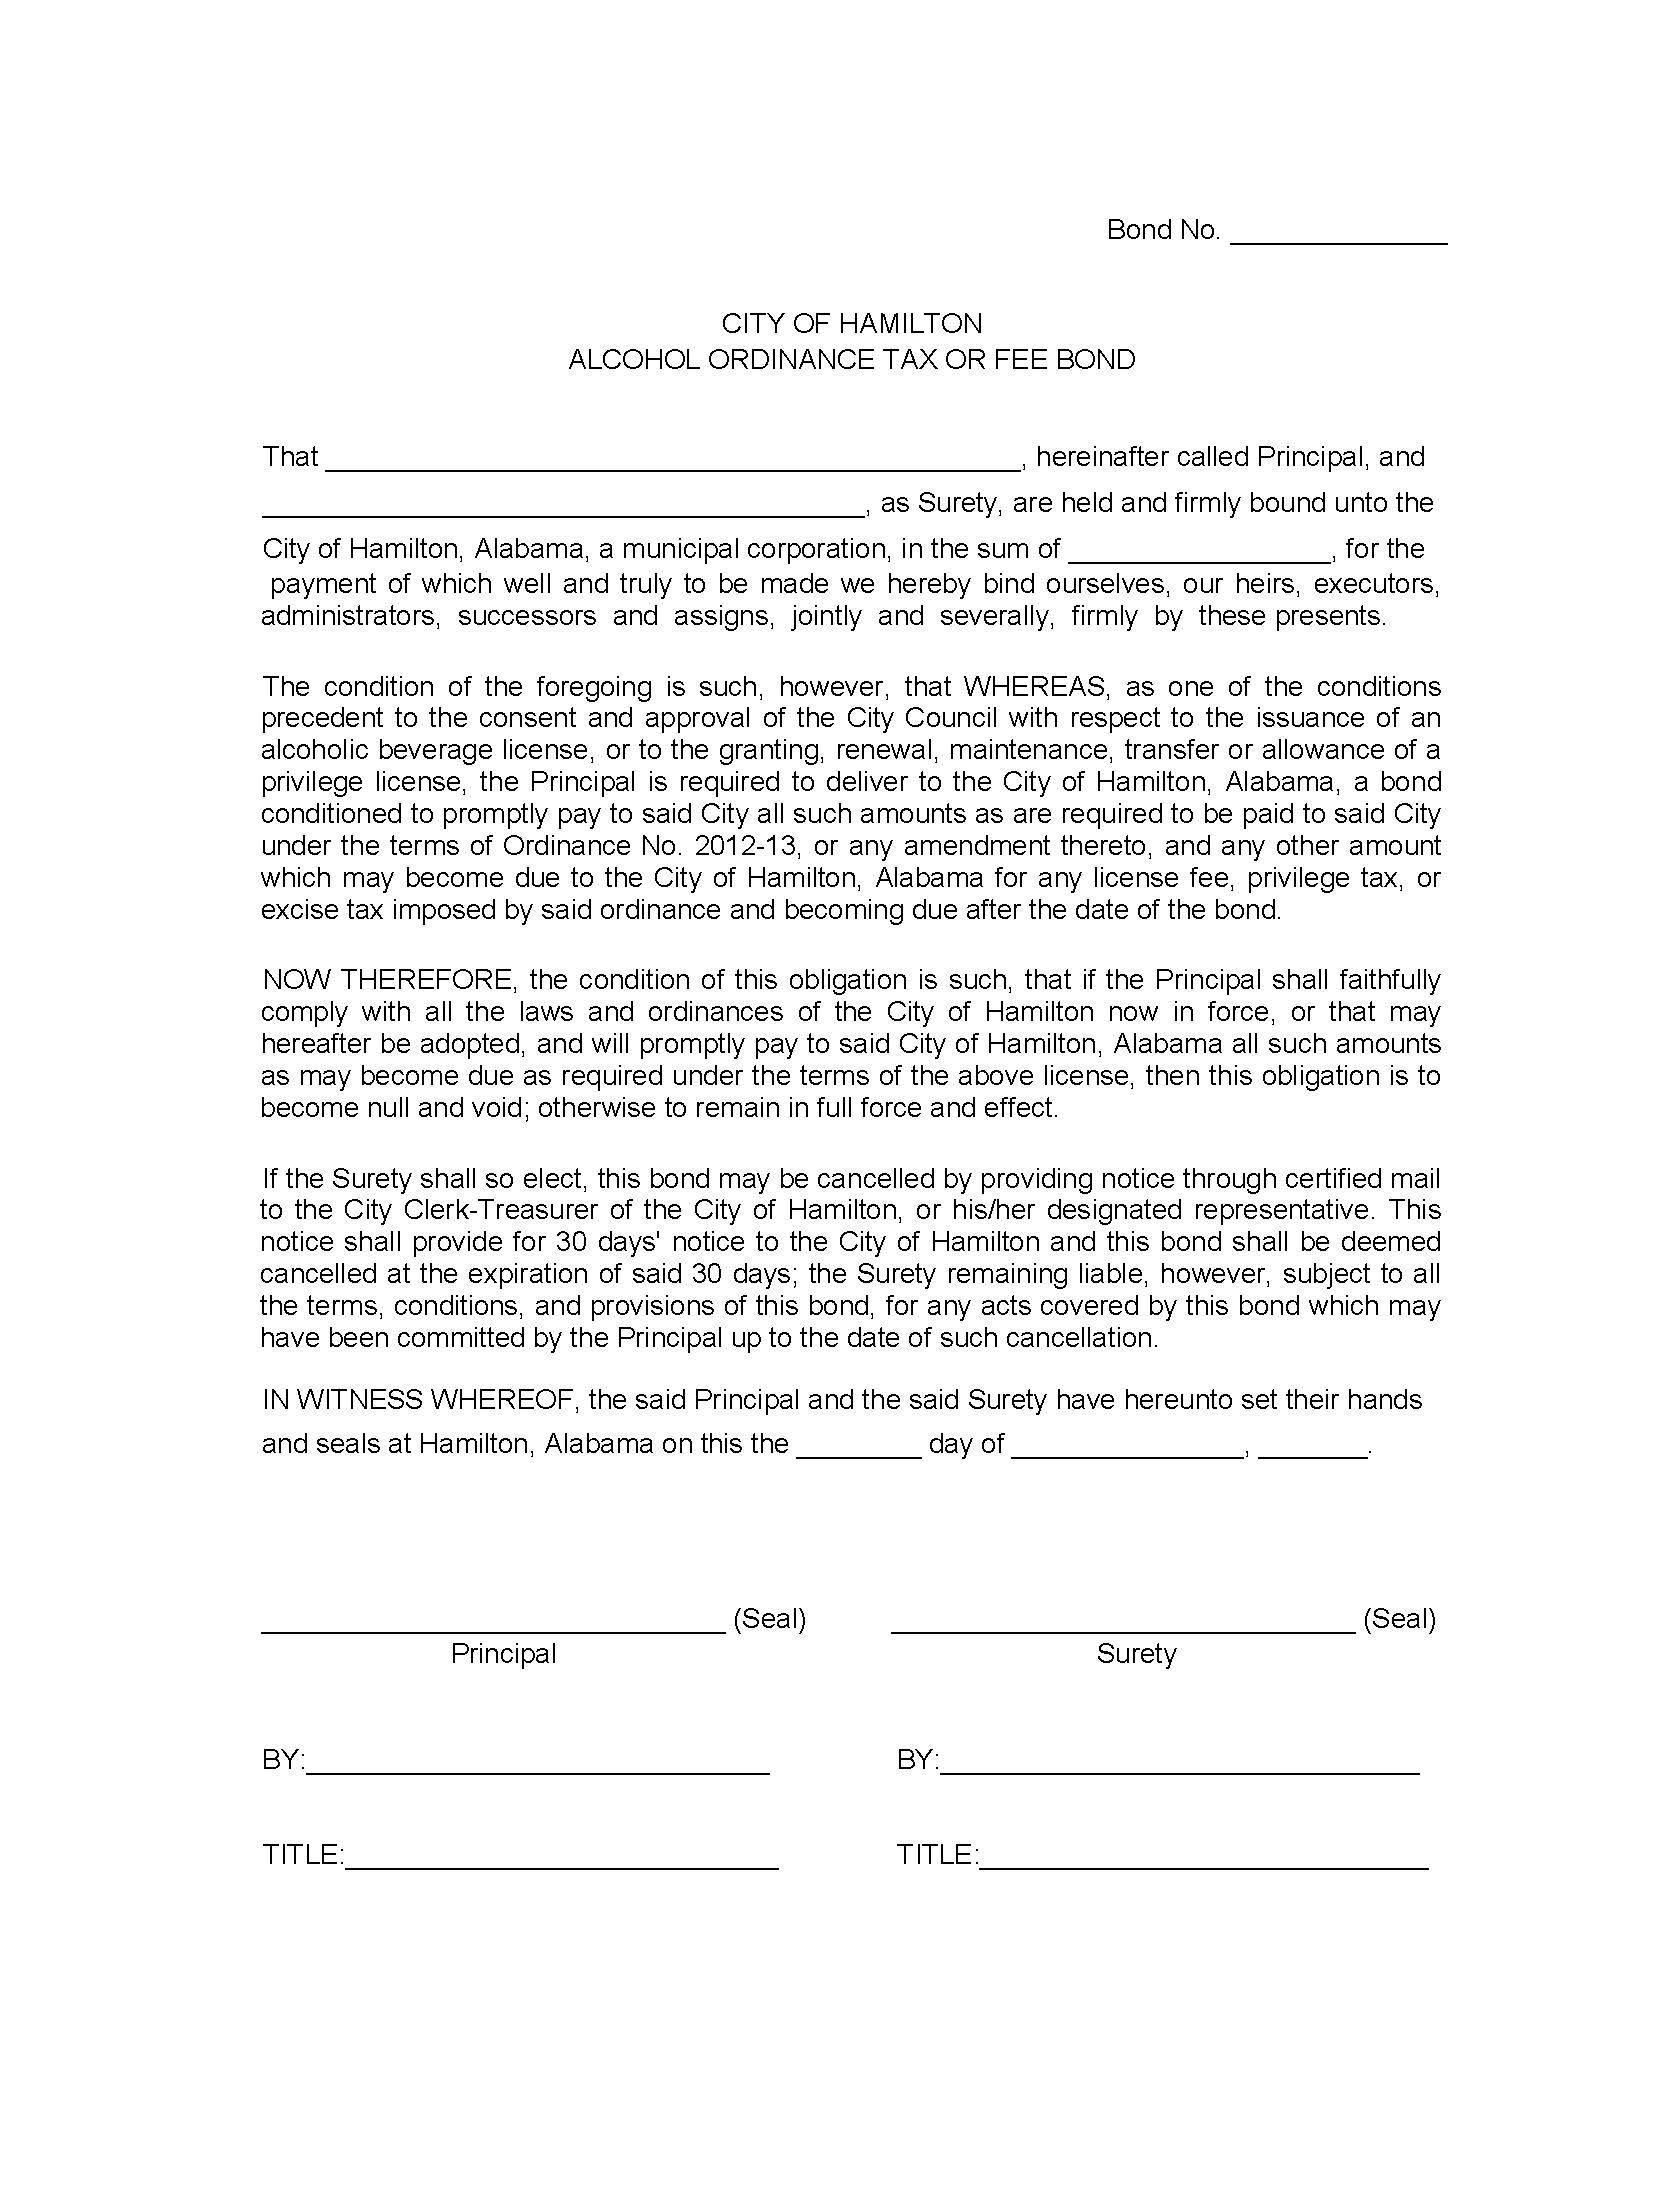 City of Hamilton Hamilton - City Alcohol Ordinance Tax or Fee Bond sample image